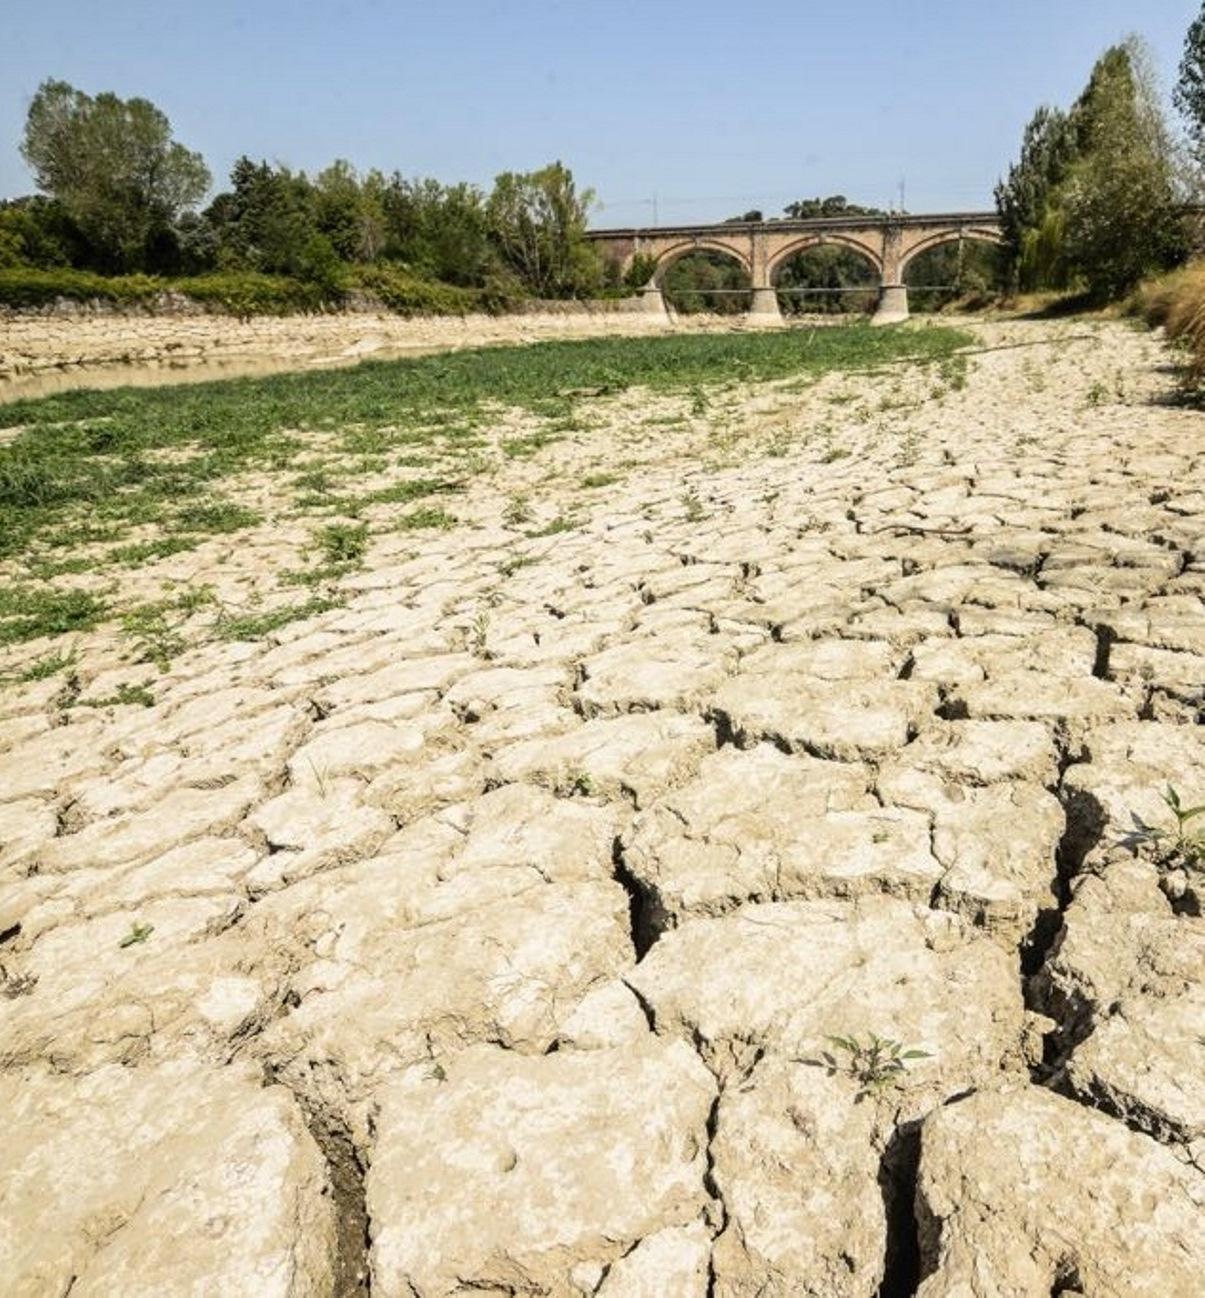 previsioni meteo caldo africano